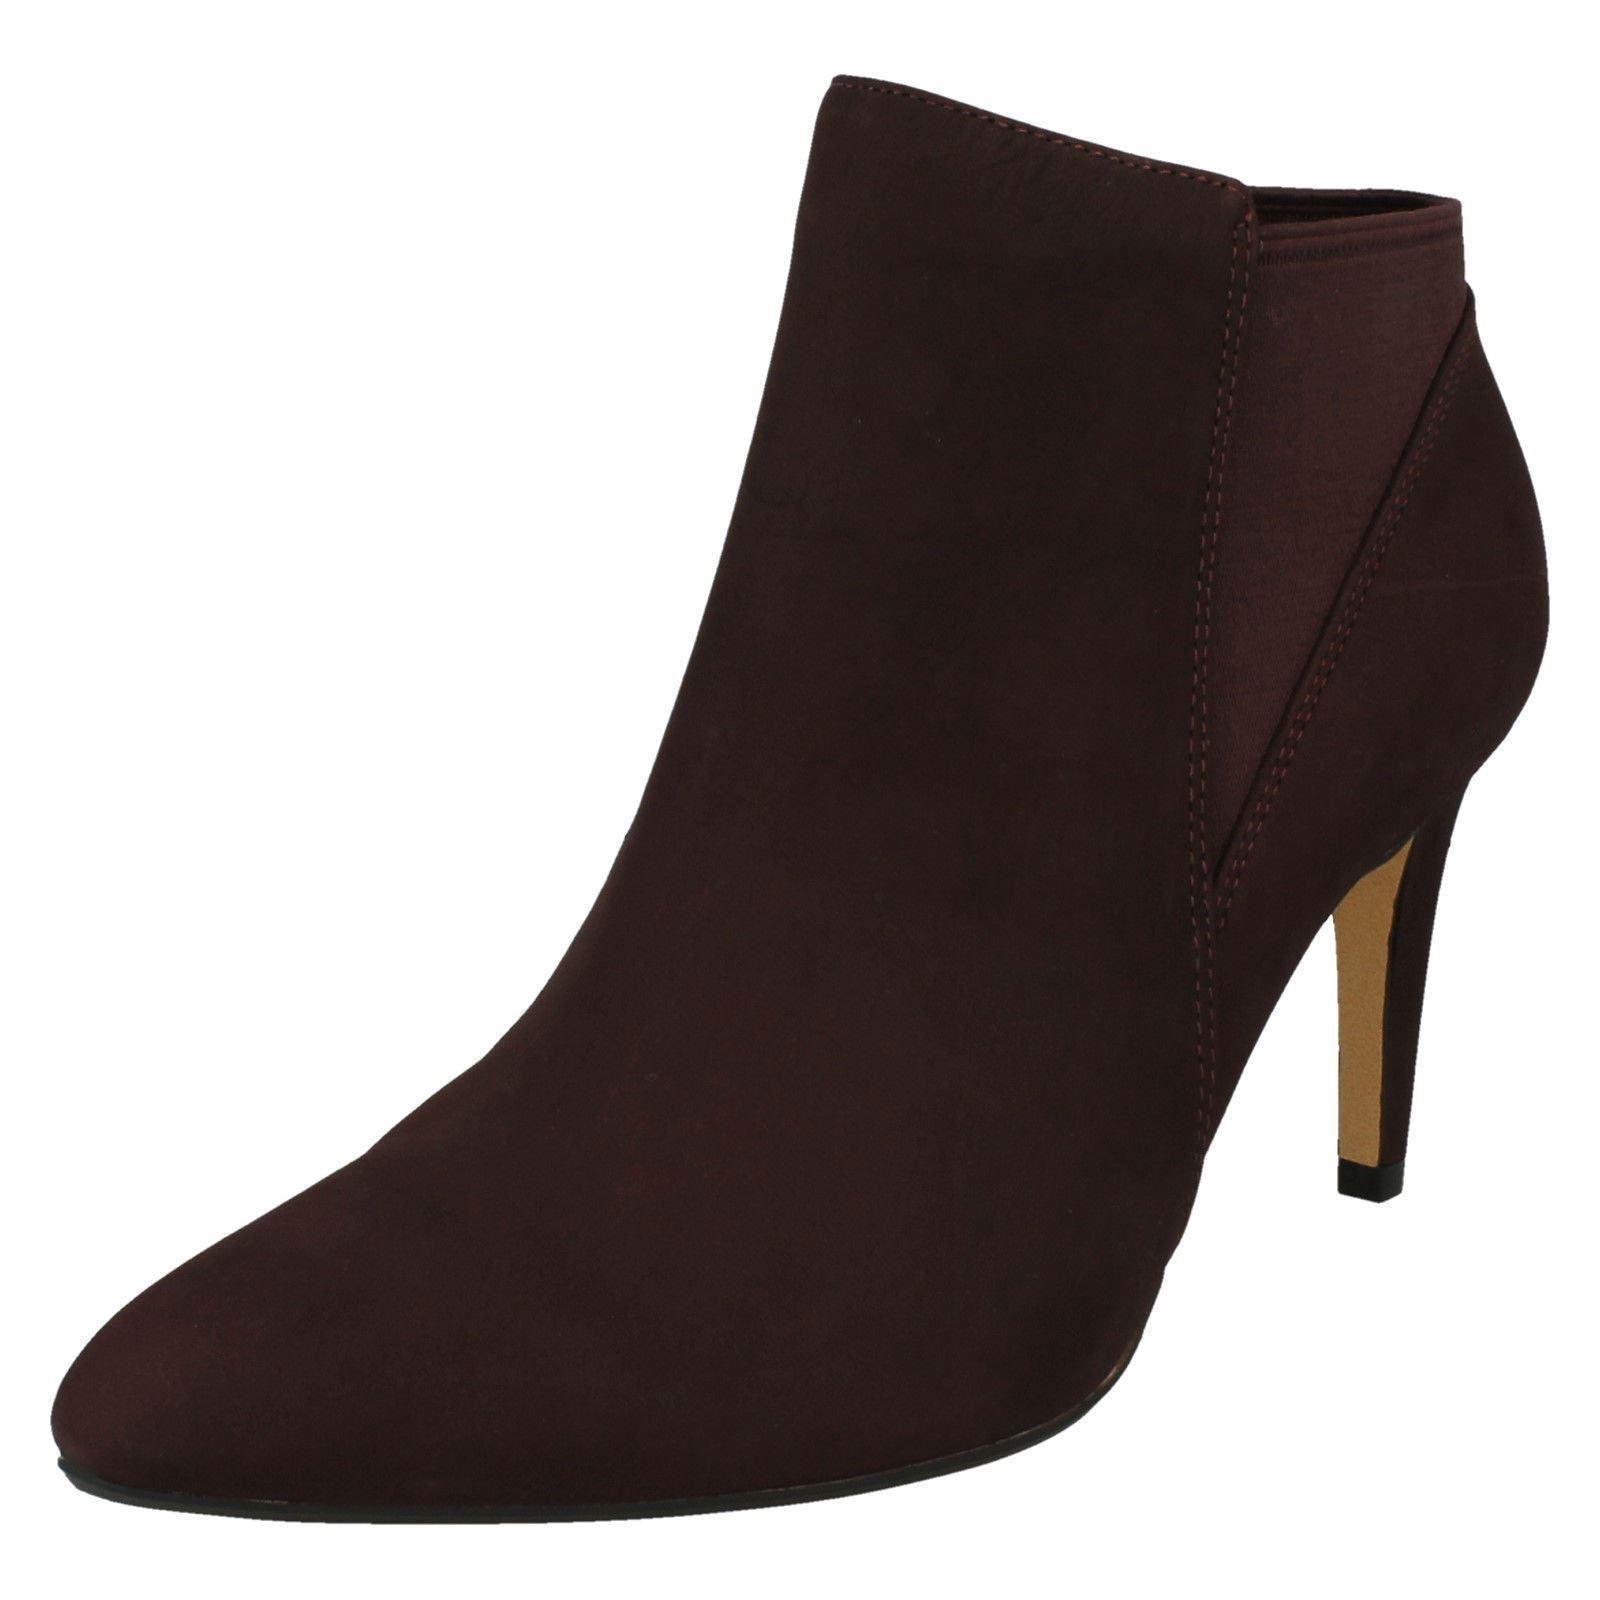 damen-Clarks Pull On Ankle Stiefel Laina Laina Laina lila   de38e4